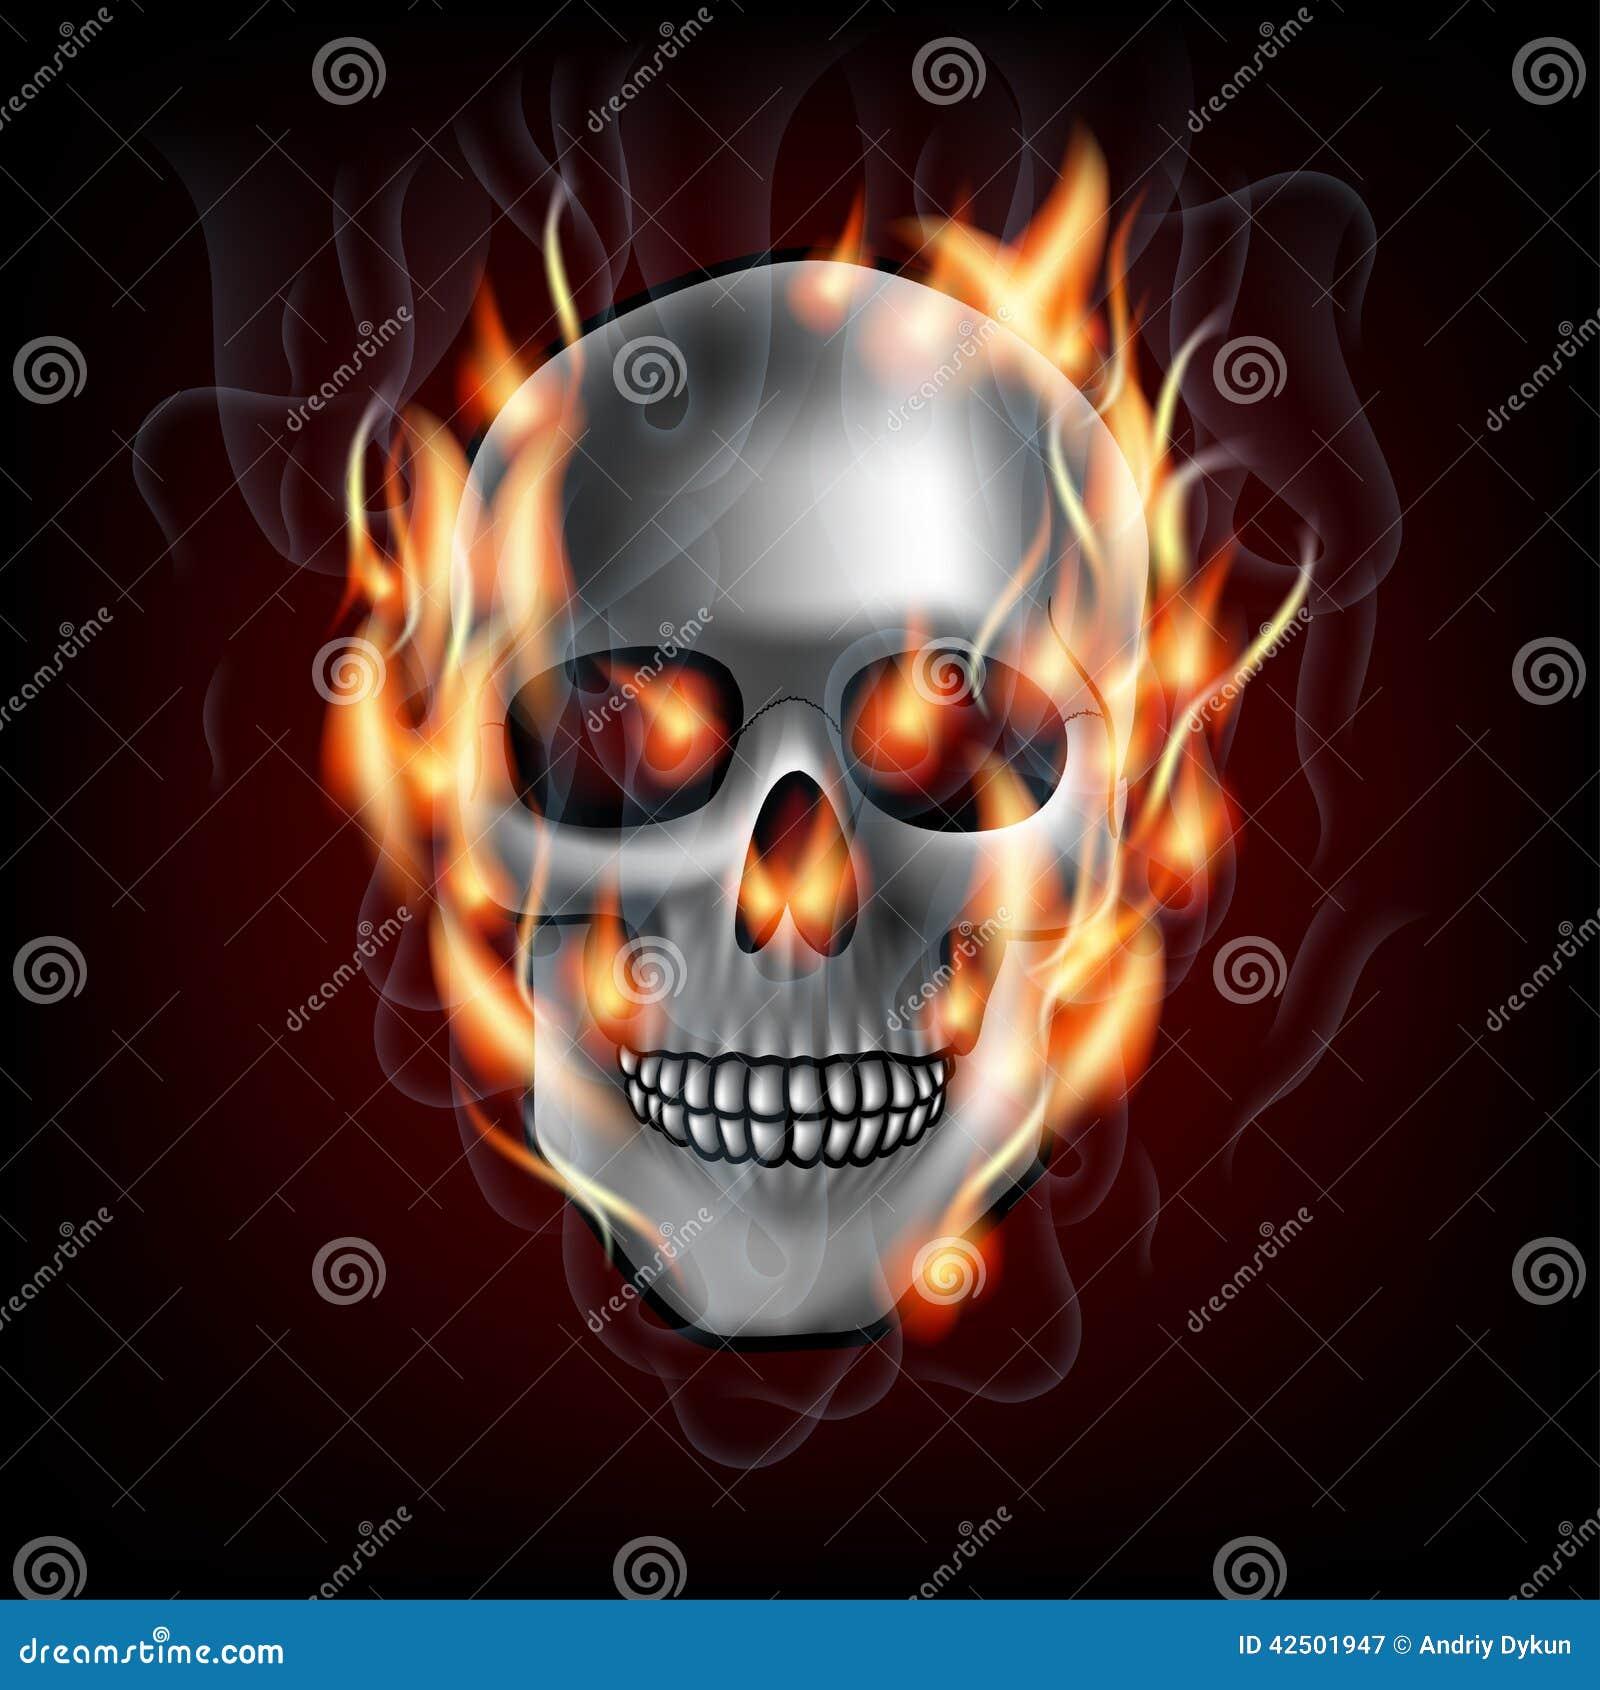 Skulls on fire purple